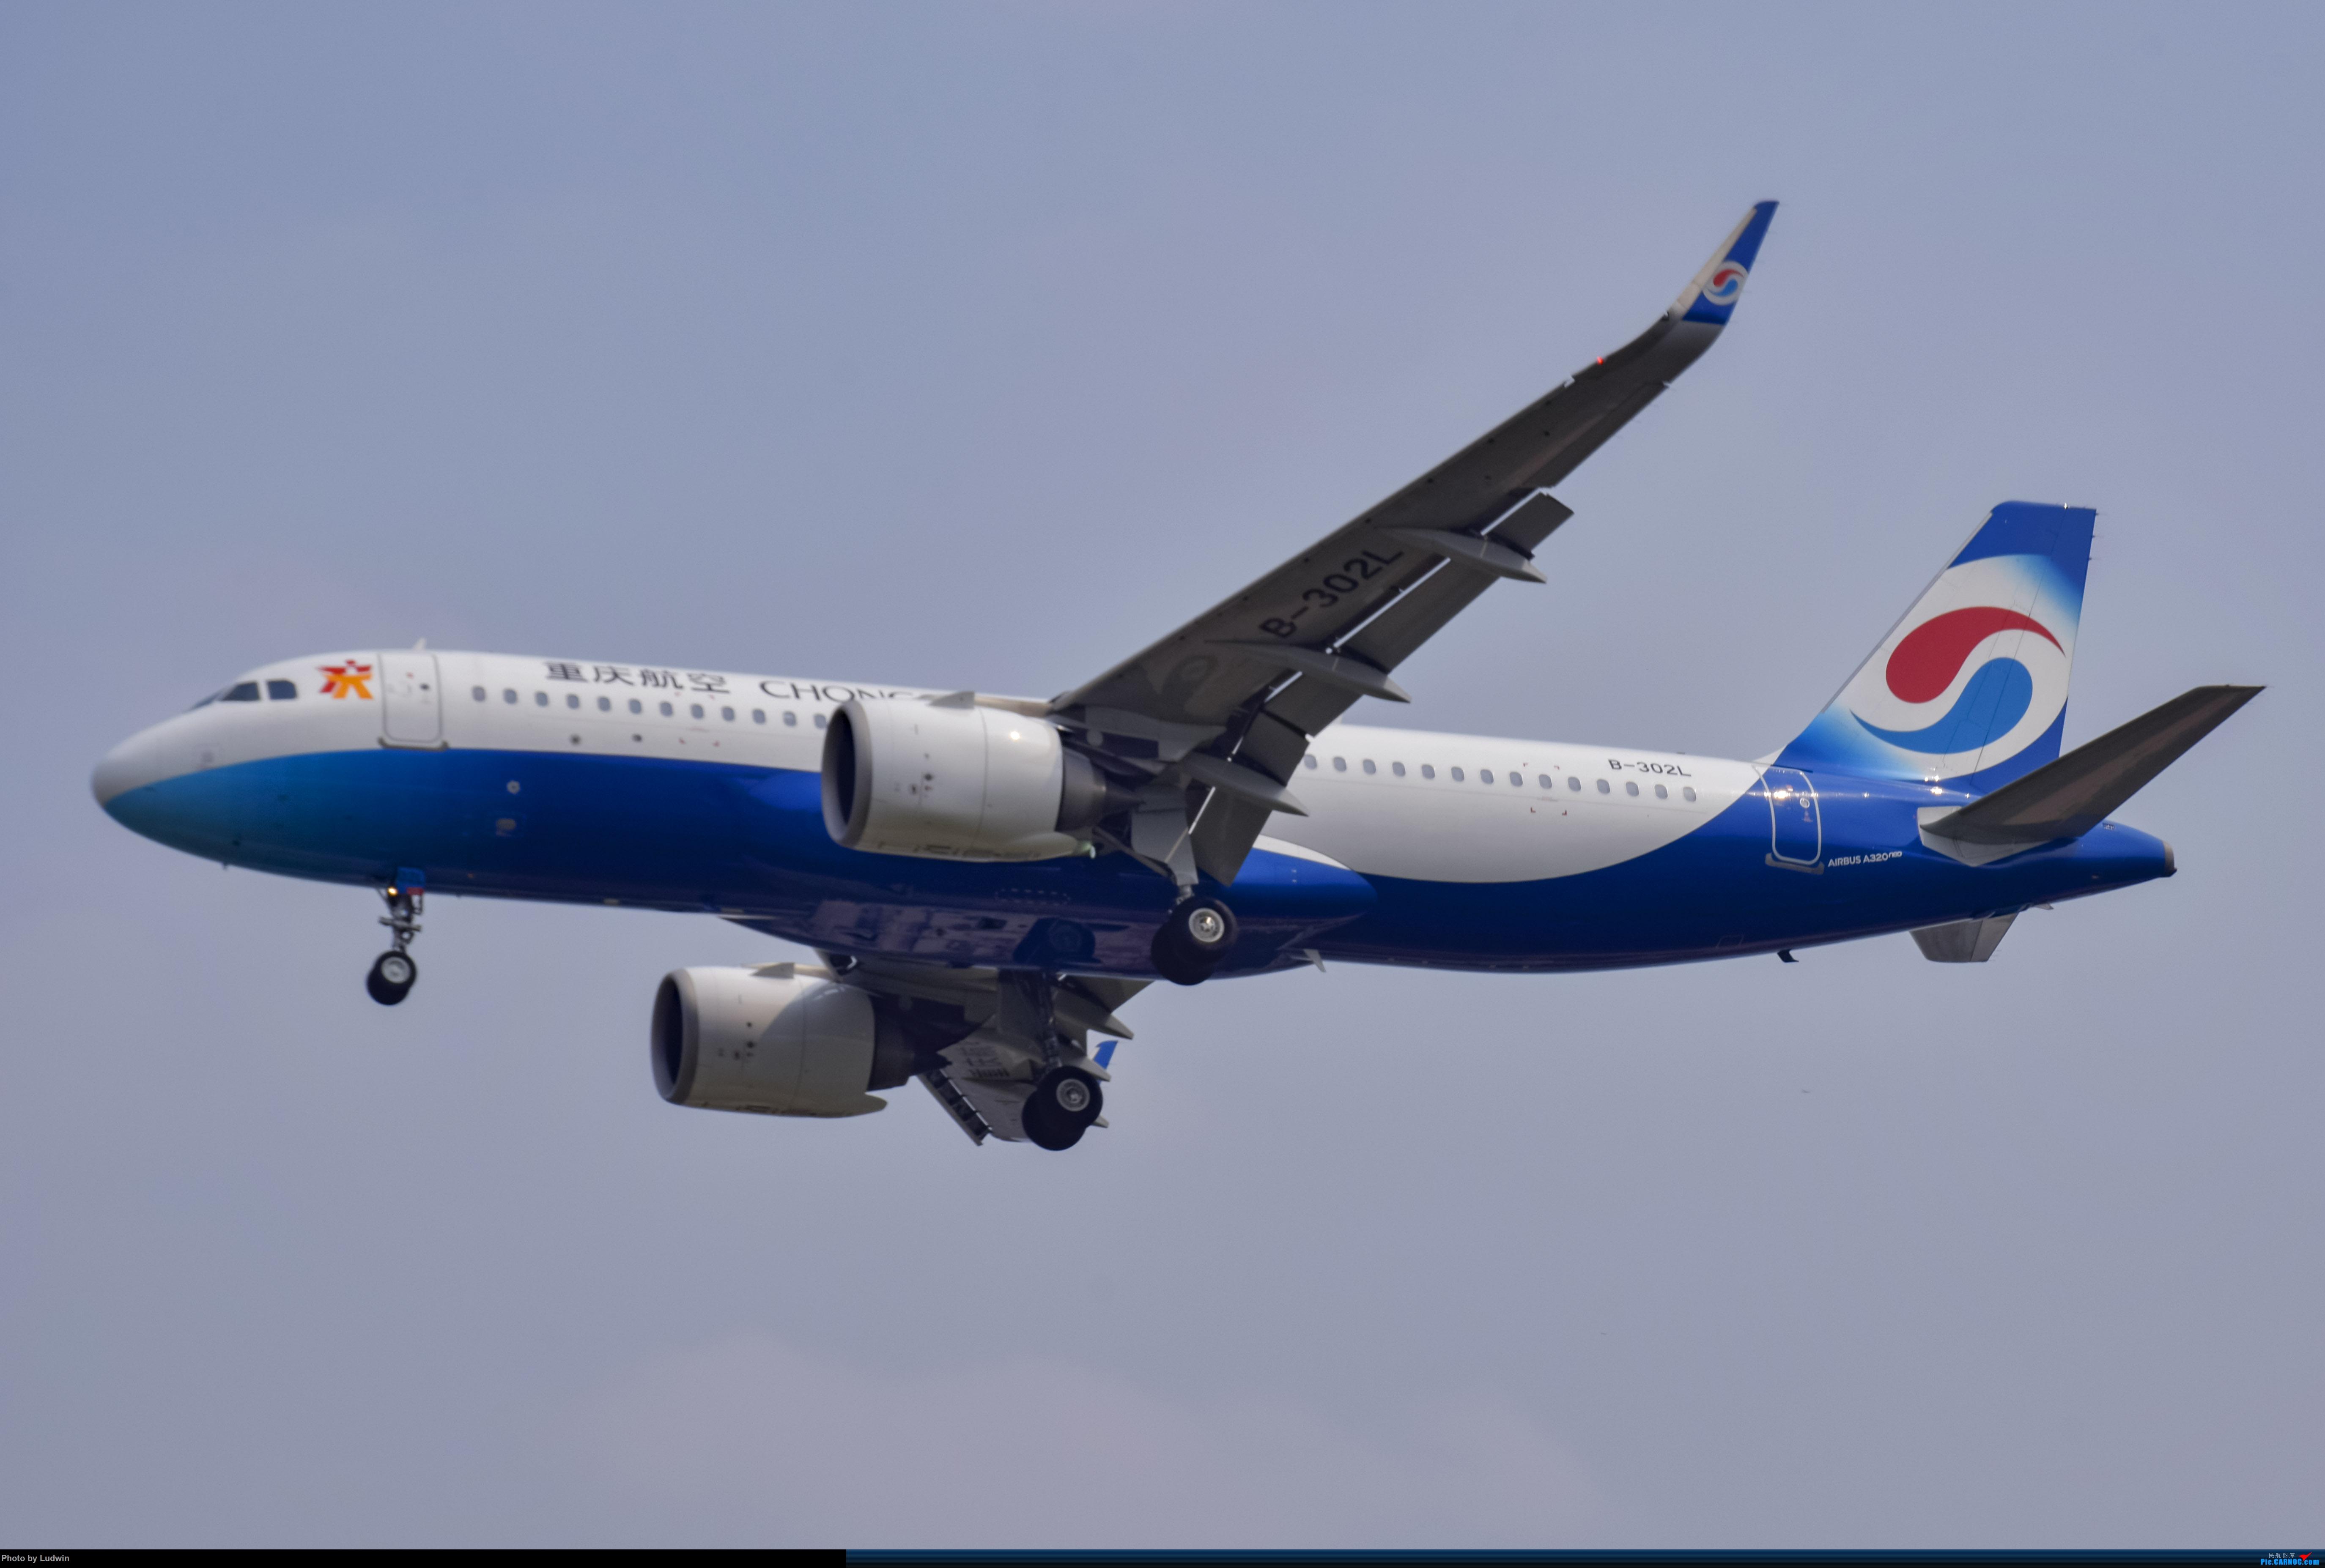 Re:[原创]没有地景系列 AIRBUS A320NEO B-302L 中国重庆江北国际机场